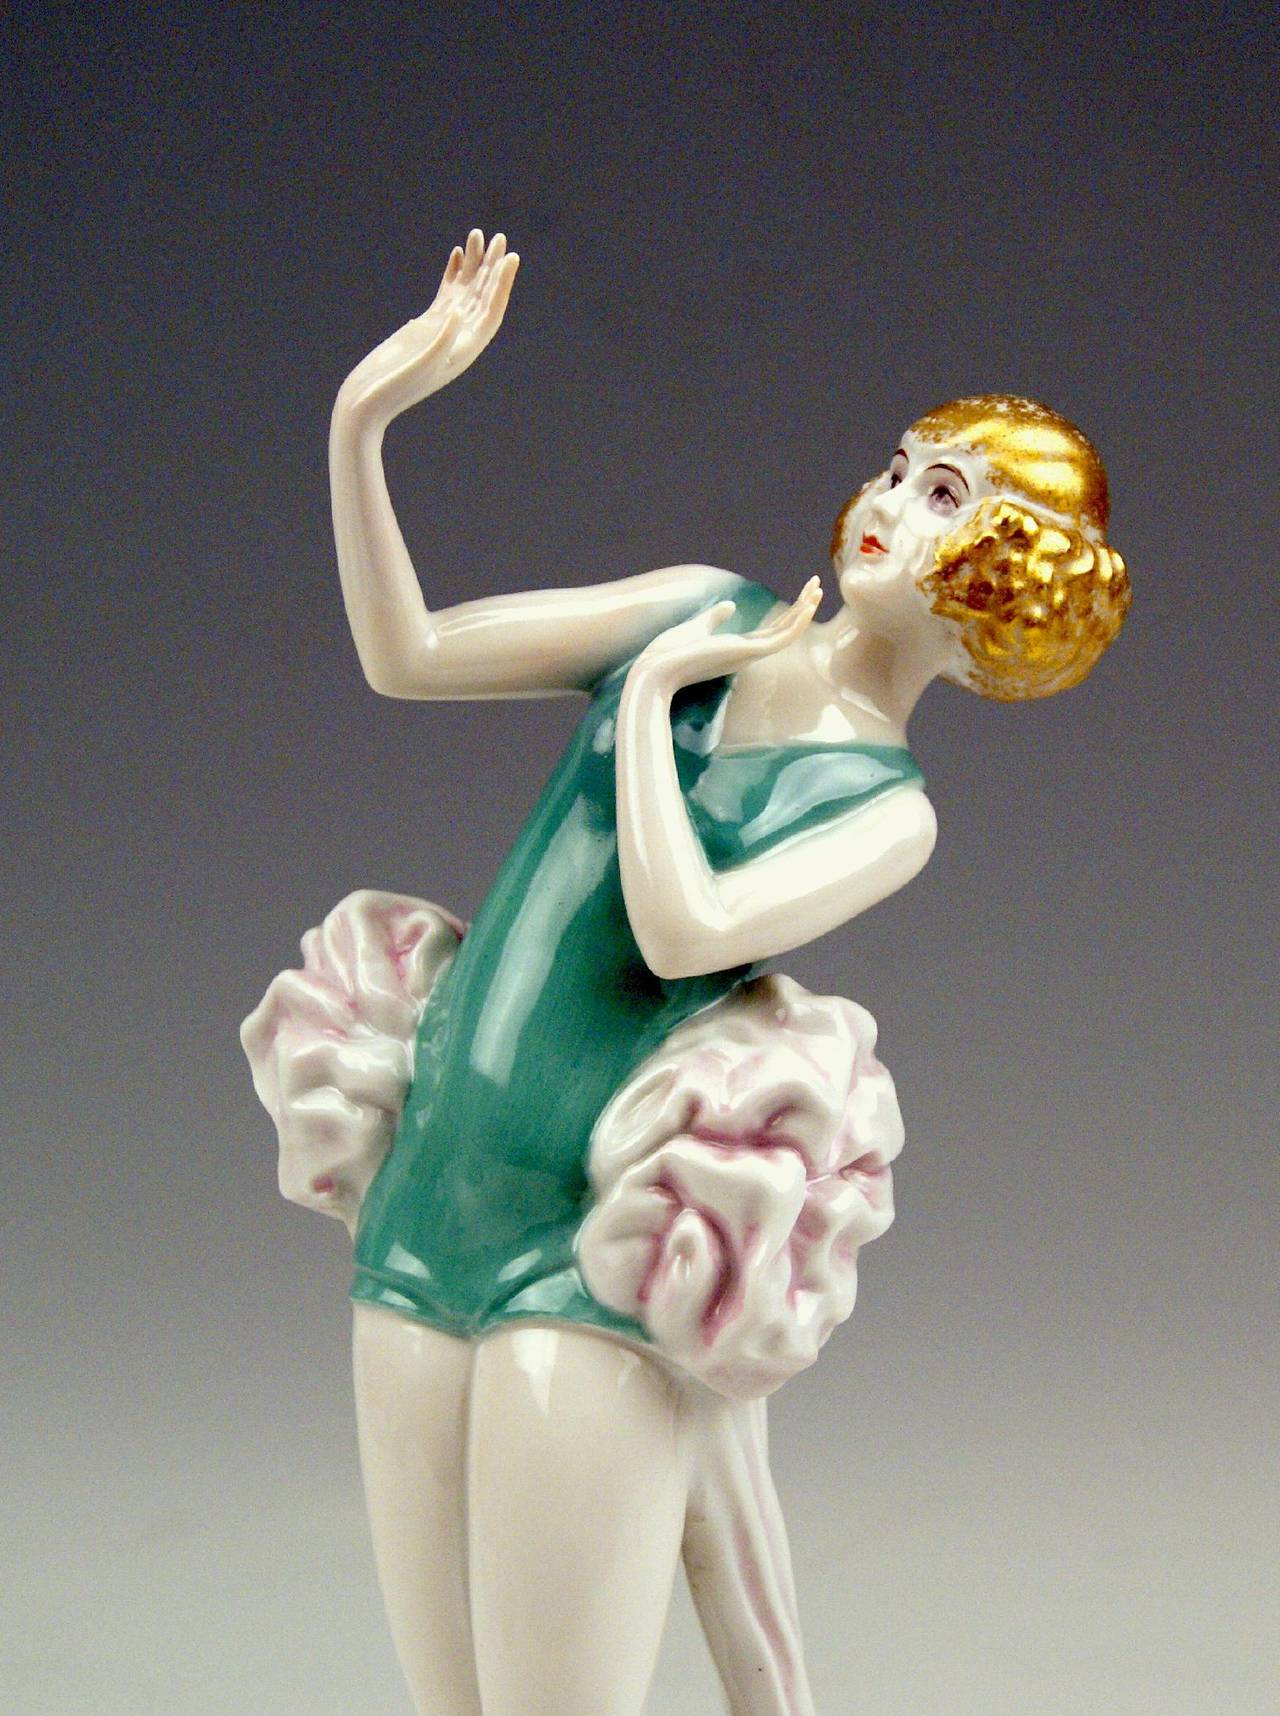 Porcelain Rosenthal Germany Female Art Deco Figurine Janine by D. Charol, circa 1929